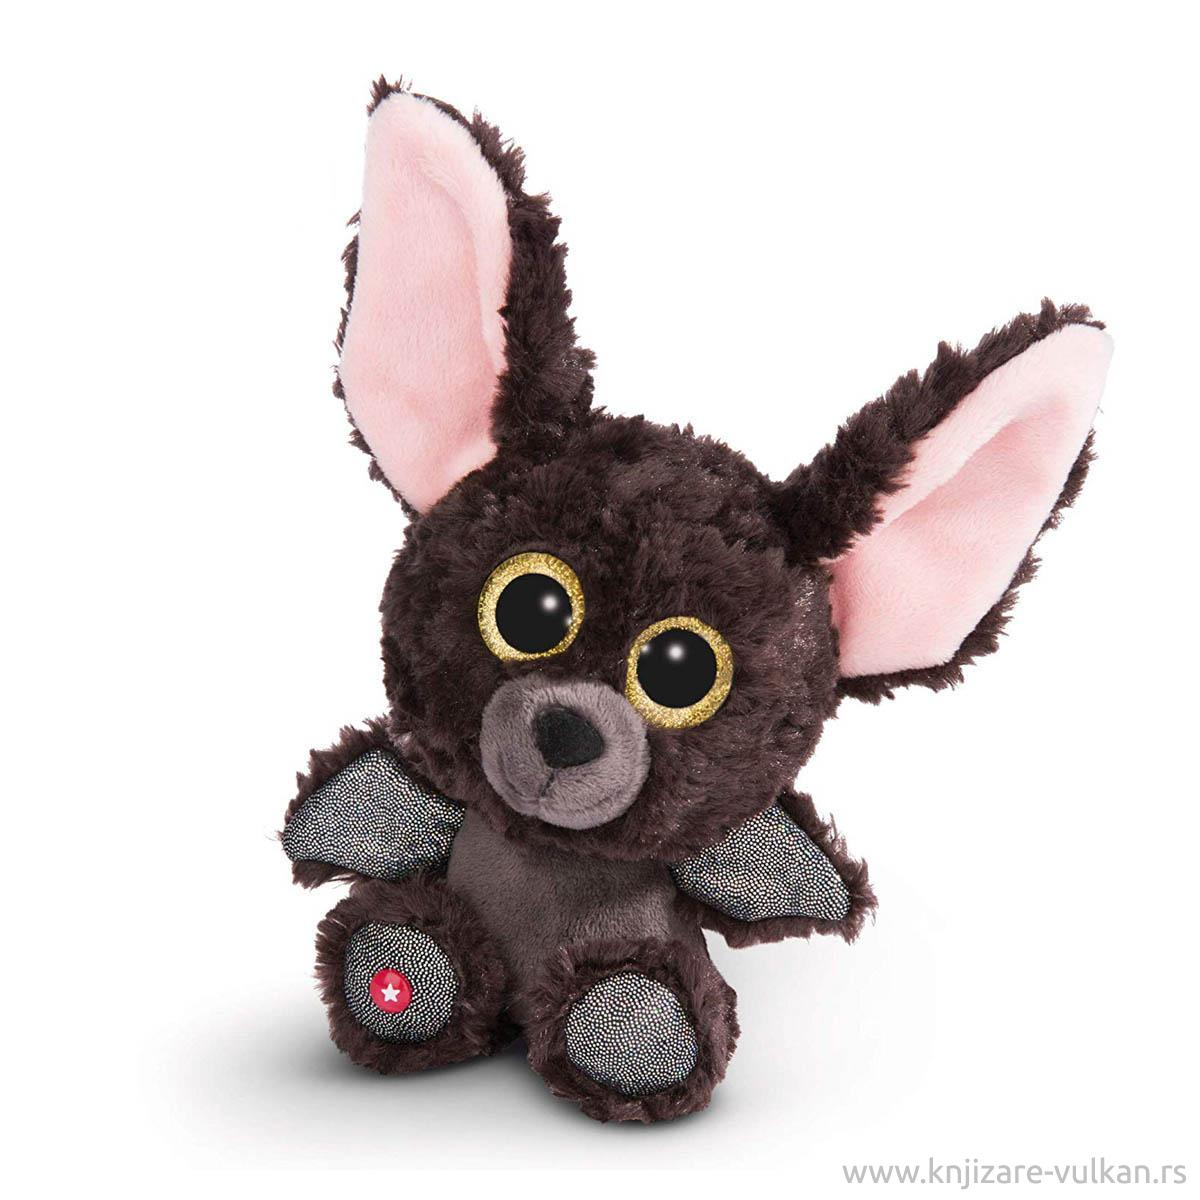 Plišana igračka GLUBSCHIS Bat Baako (15 cm)